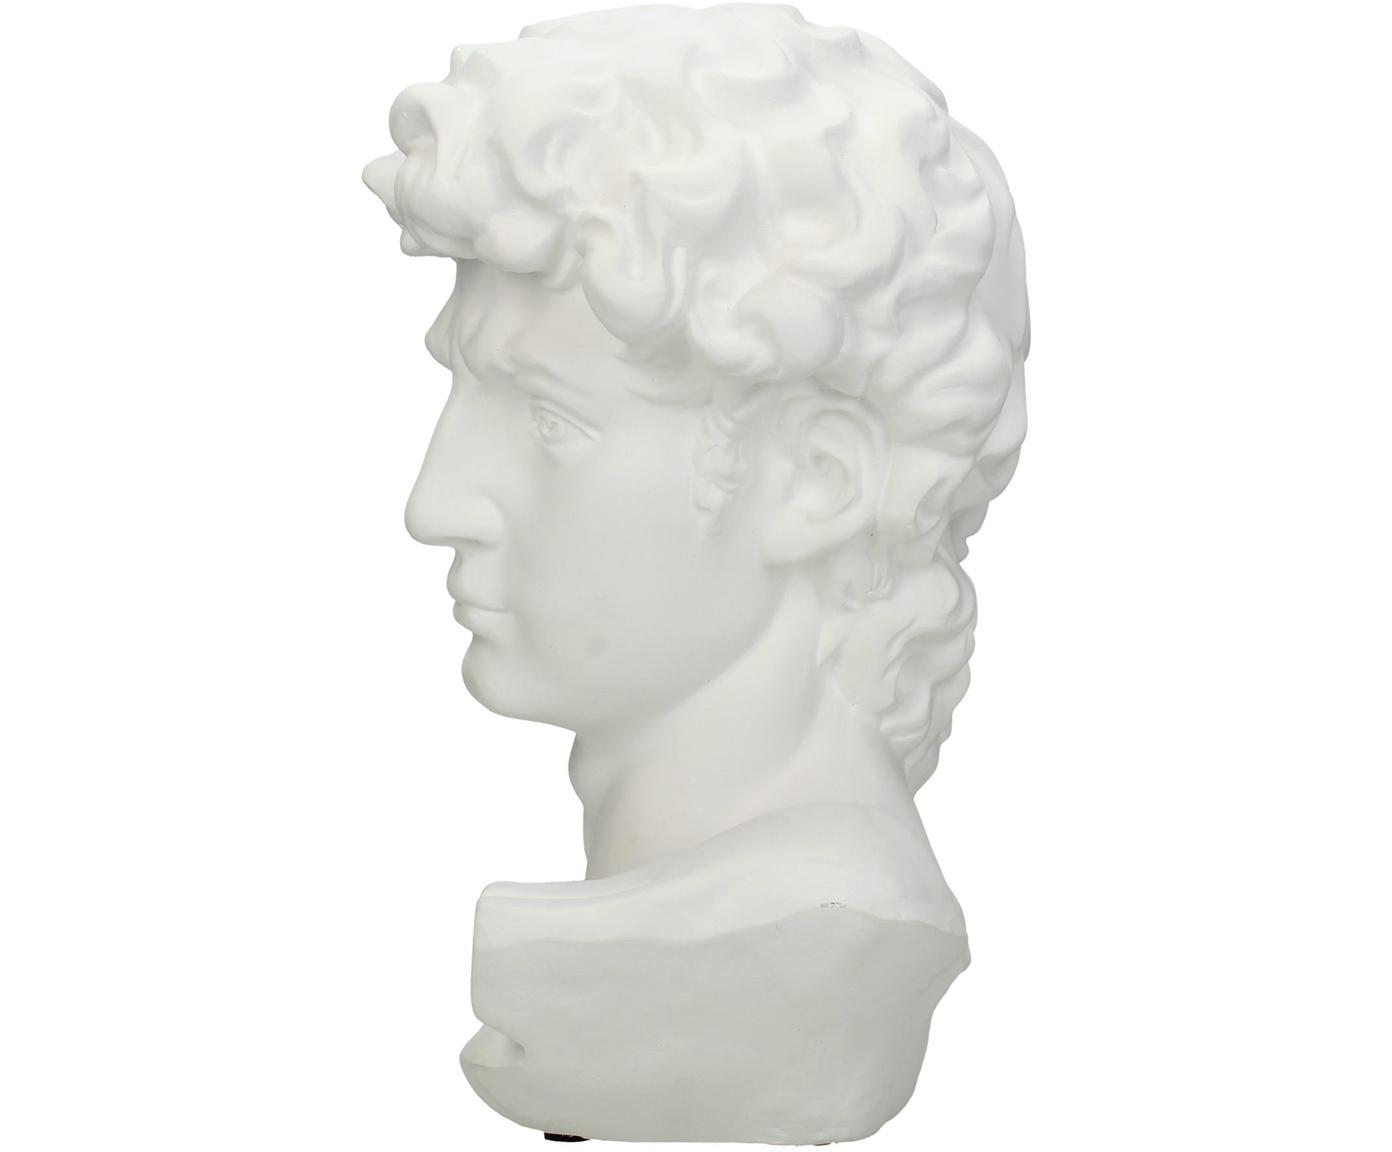 Deko-Objekt David, Polyresin, Weiß, 17 x 30 cm